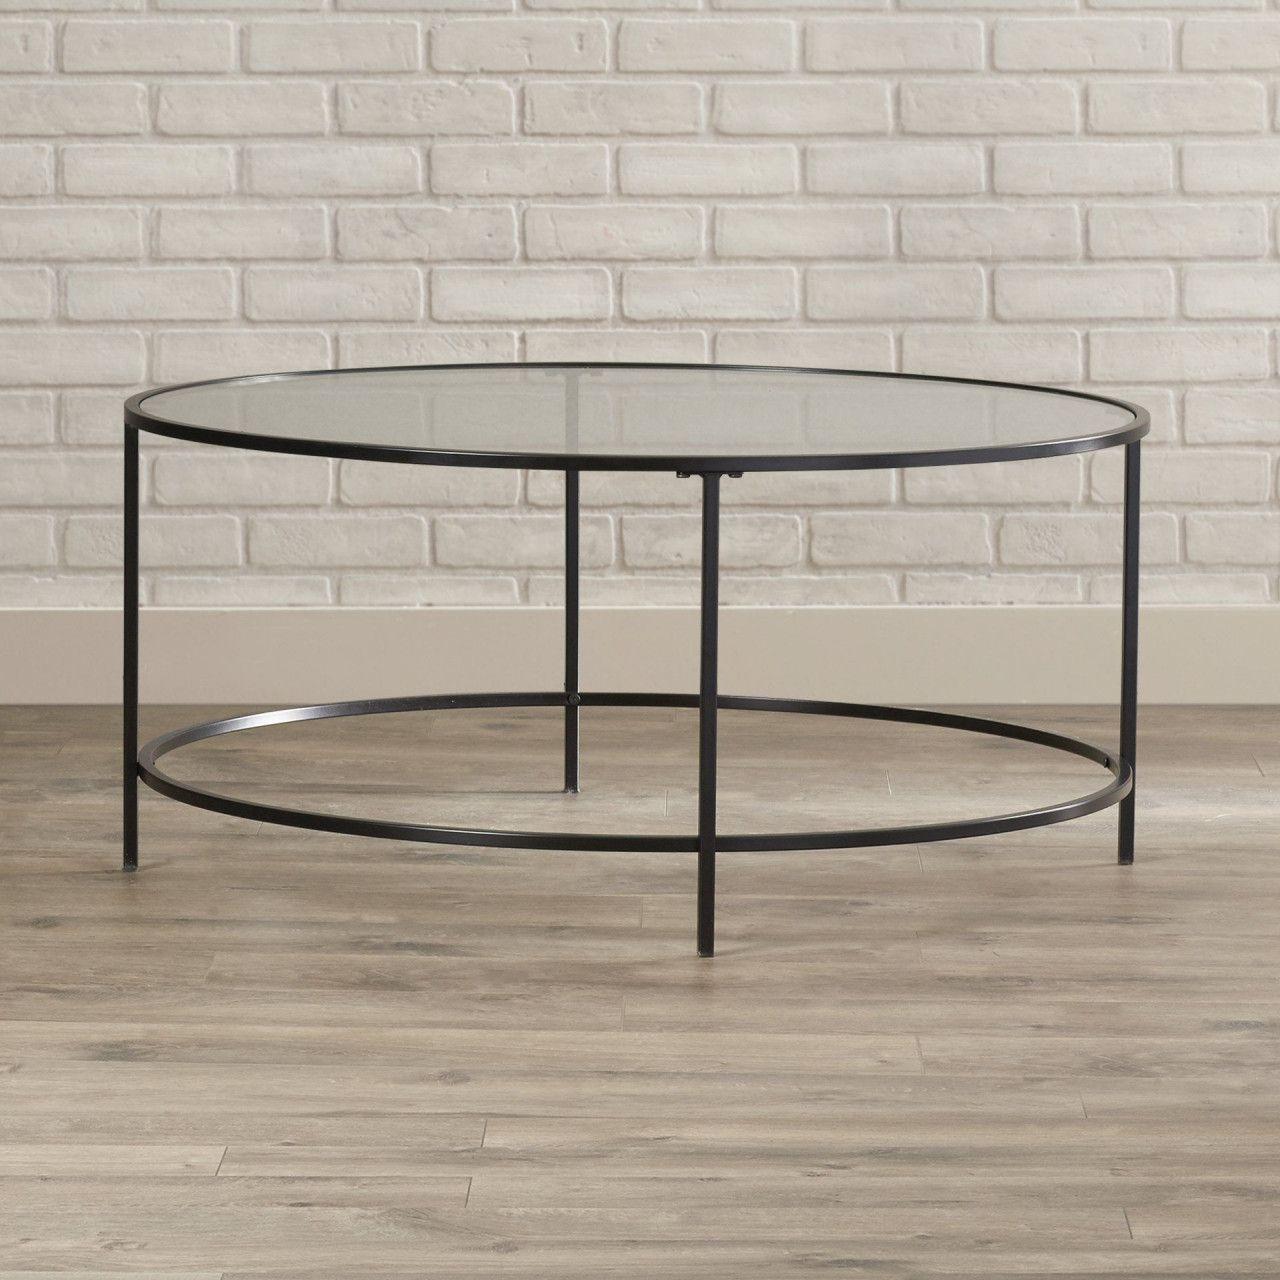 Shauna Coffee Table Coffee Table Livingroom Pinterest Coffee Table Round Glass Coffee Table Living Room Coffee Table Furniture [ 1280 x 1280 Pixel ]